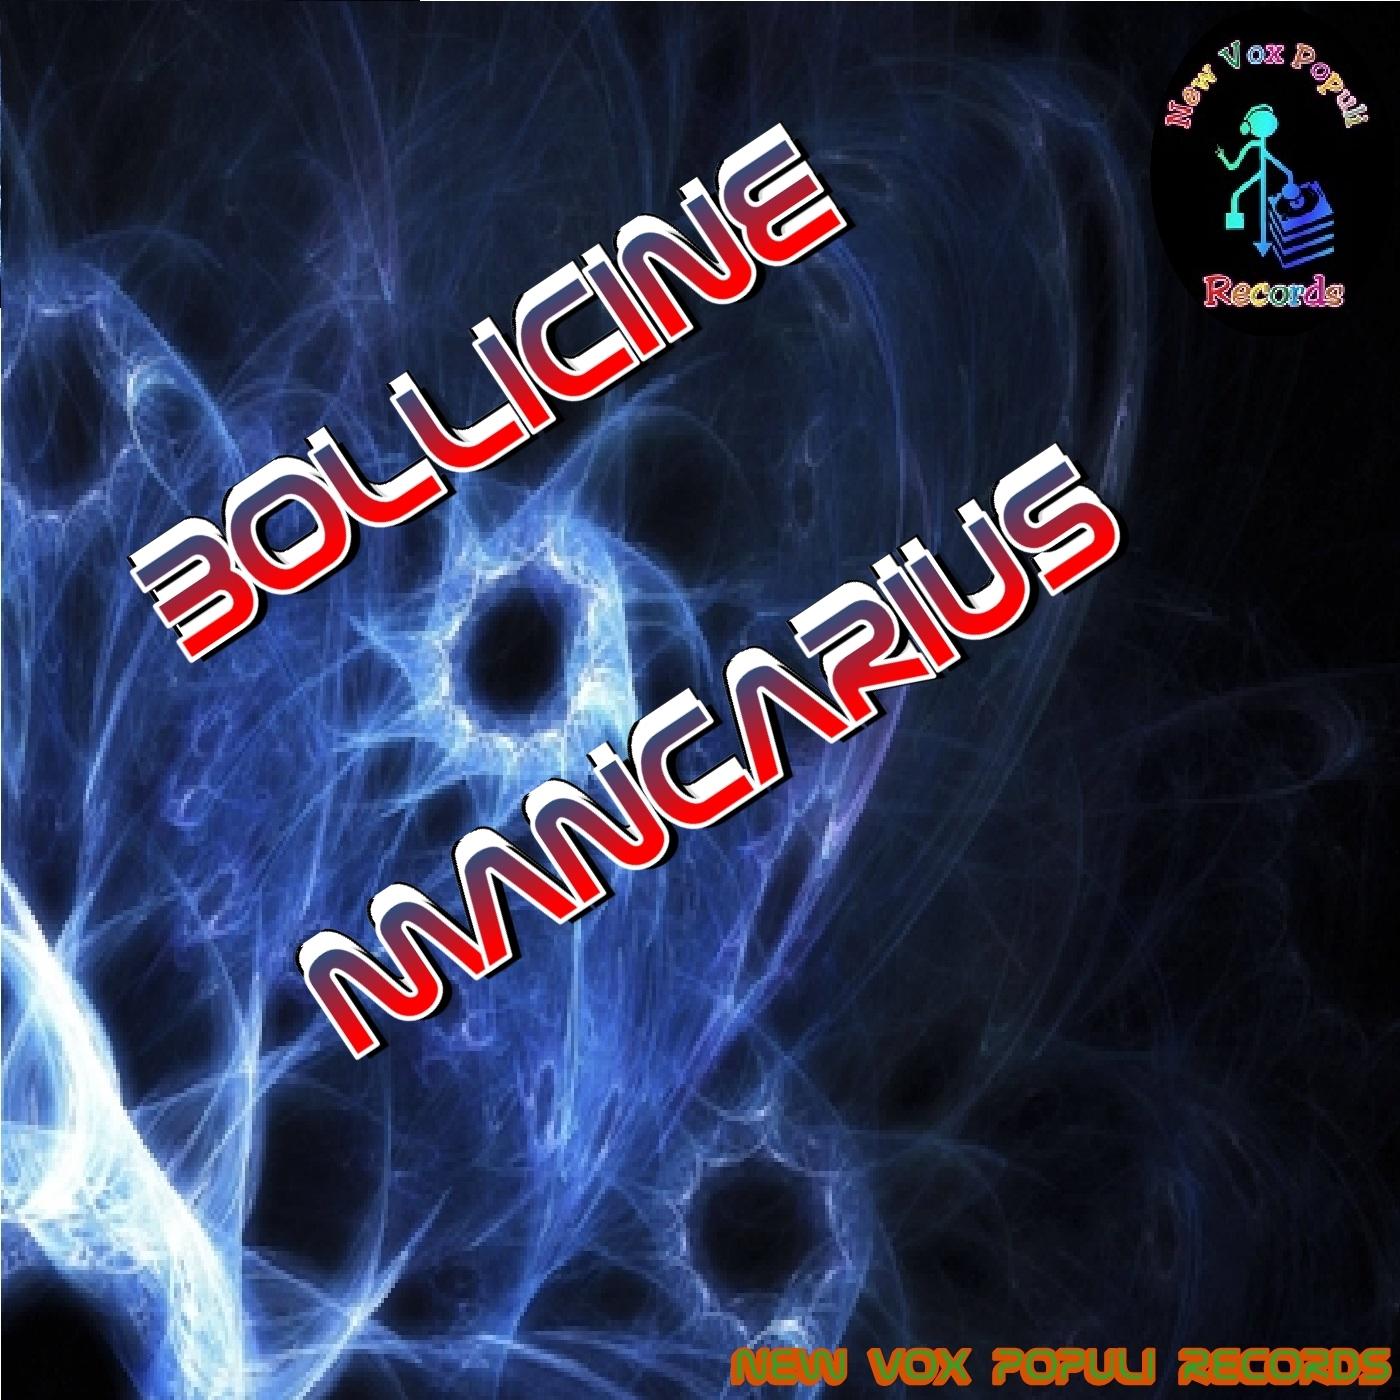 Mancarius - Bollicine (Original mix)